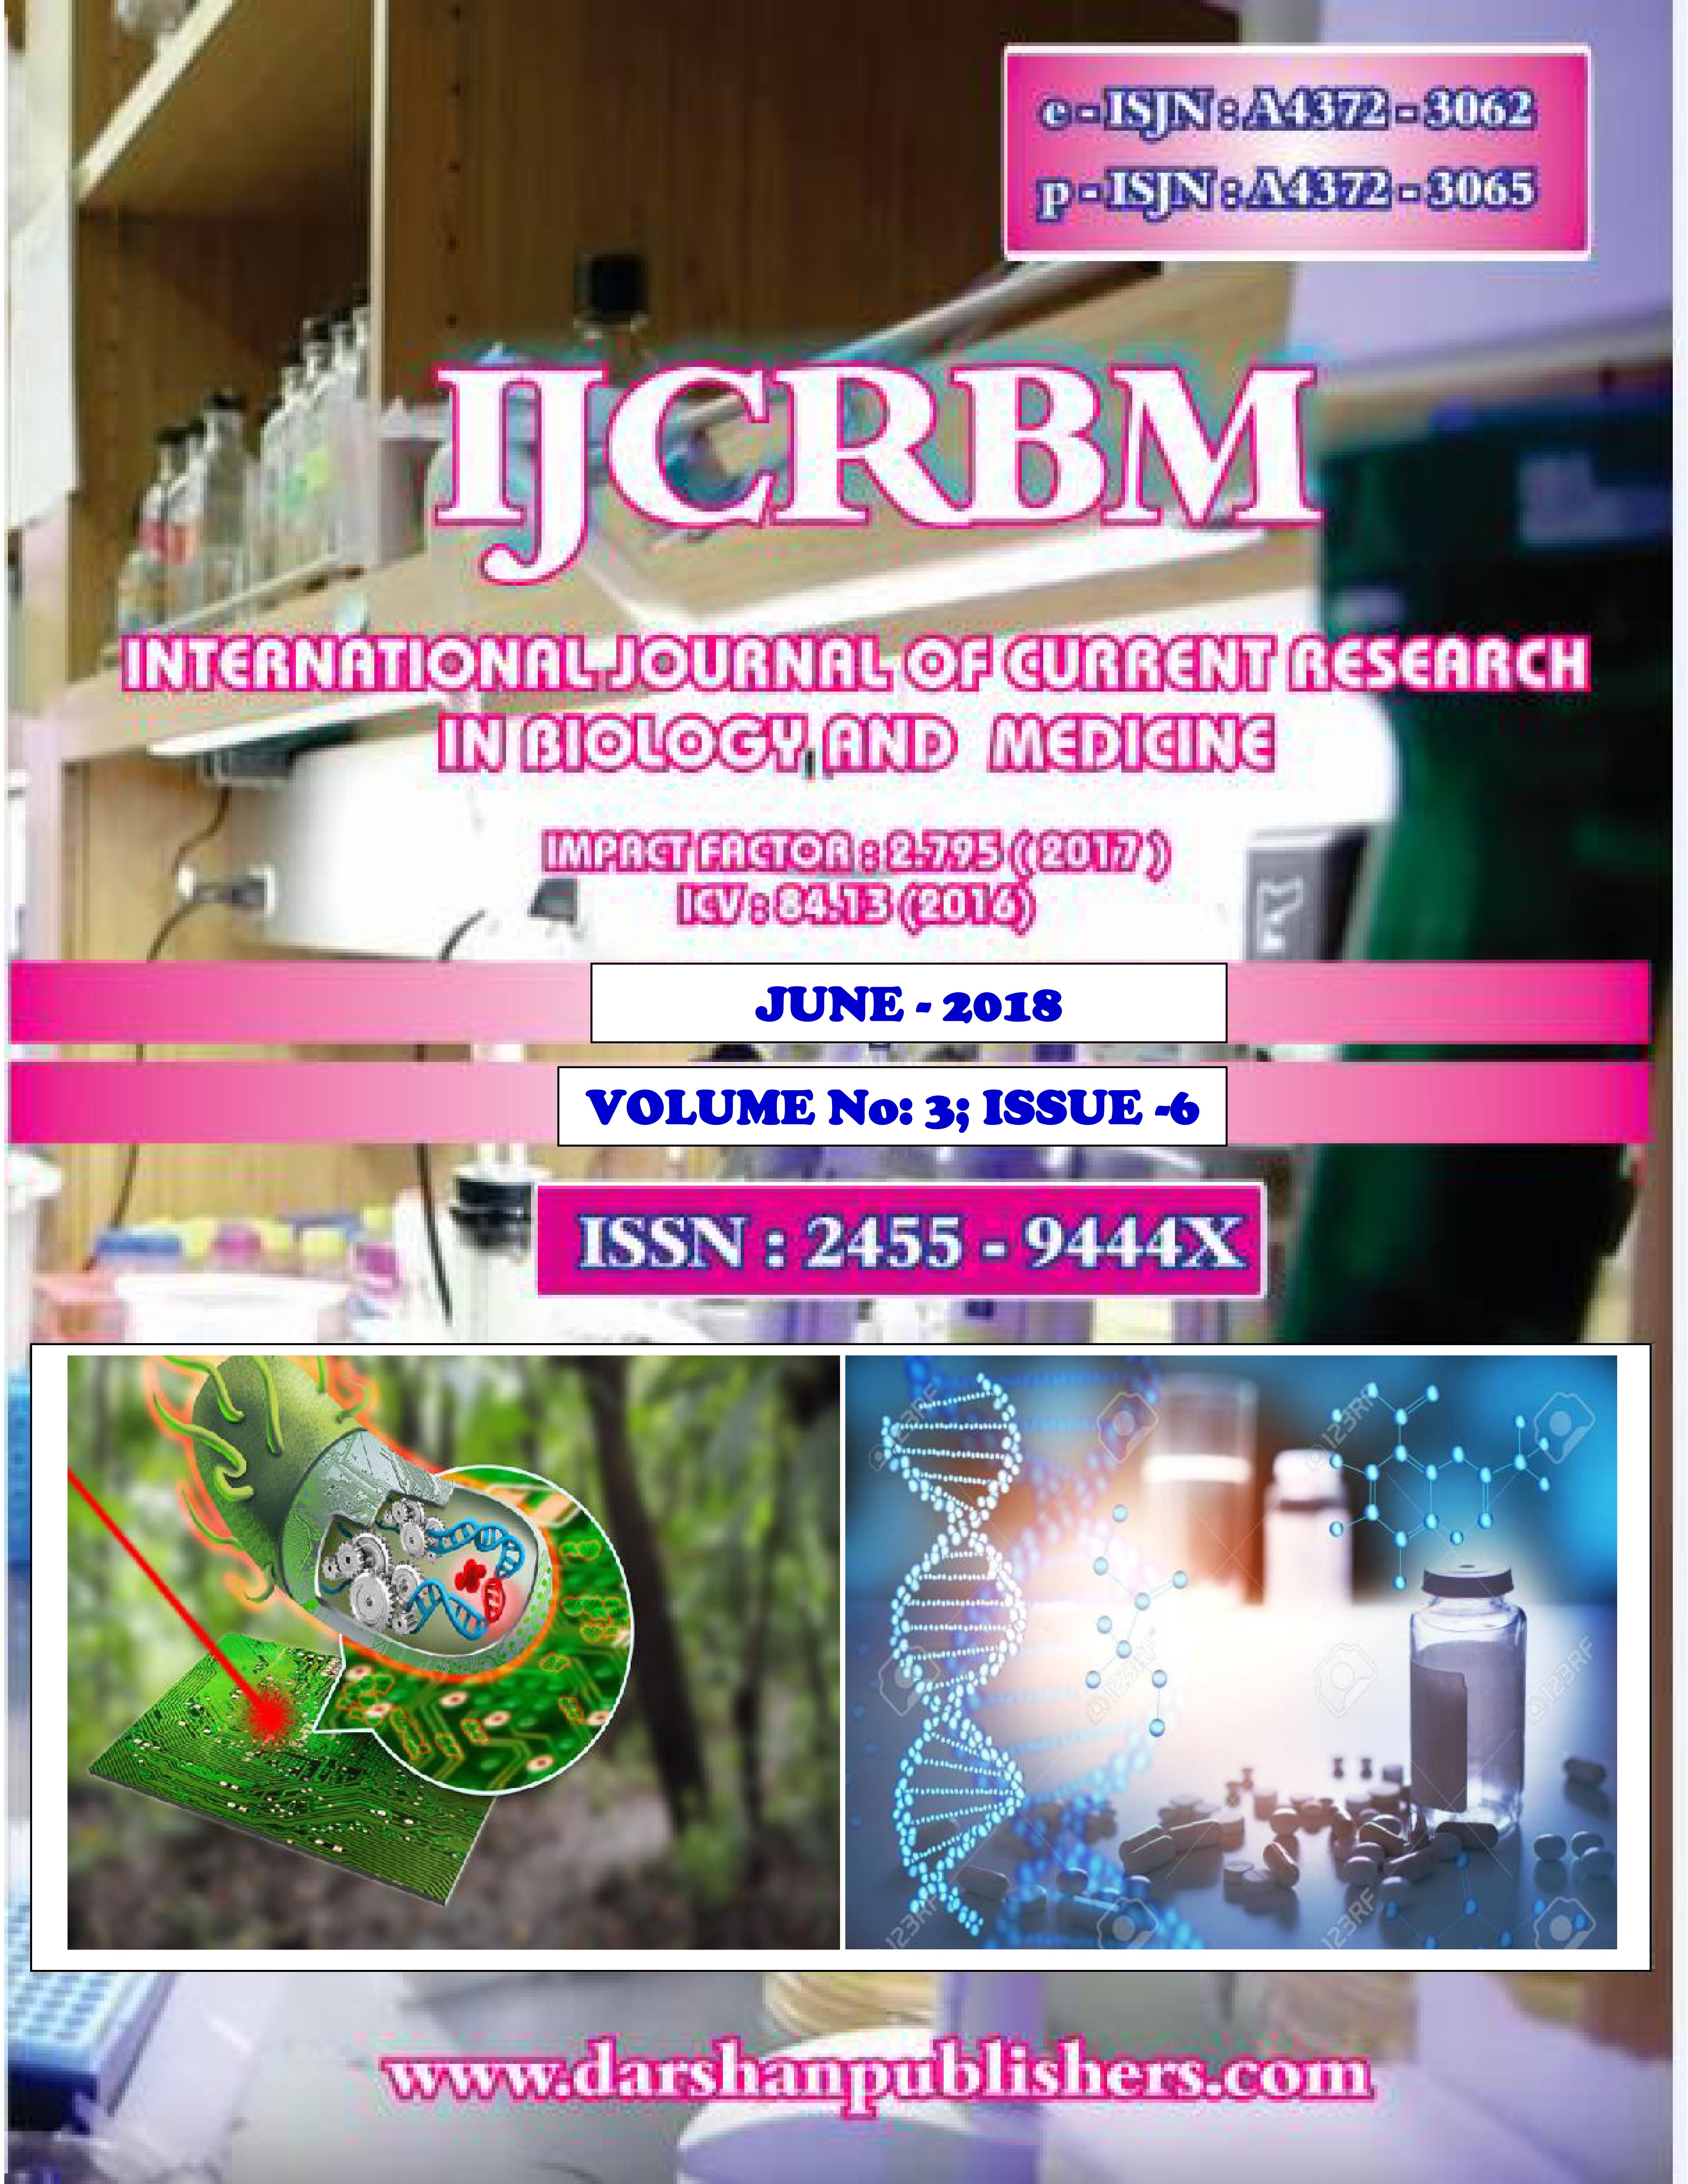 IJCRBM Homepage